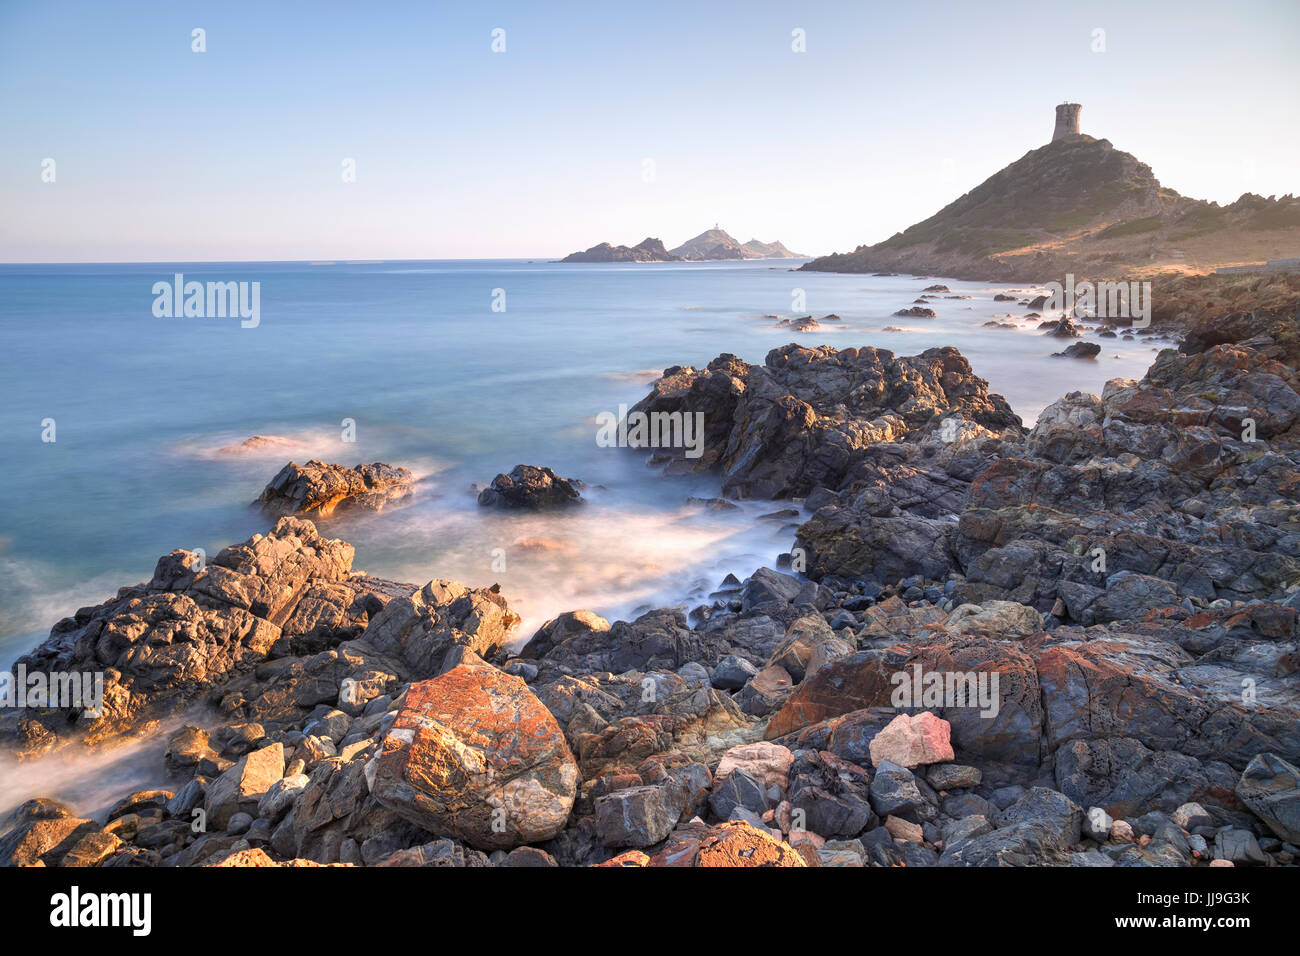 Pointe de la Parata, Iles Sanguinaires, Ajaccio, Corsica, France - Stock Image